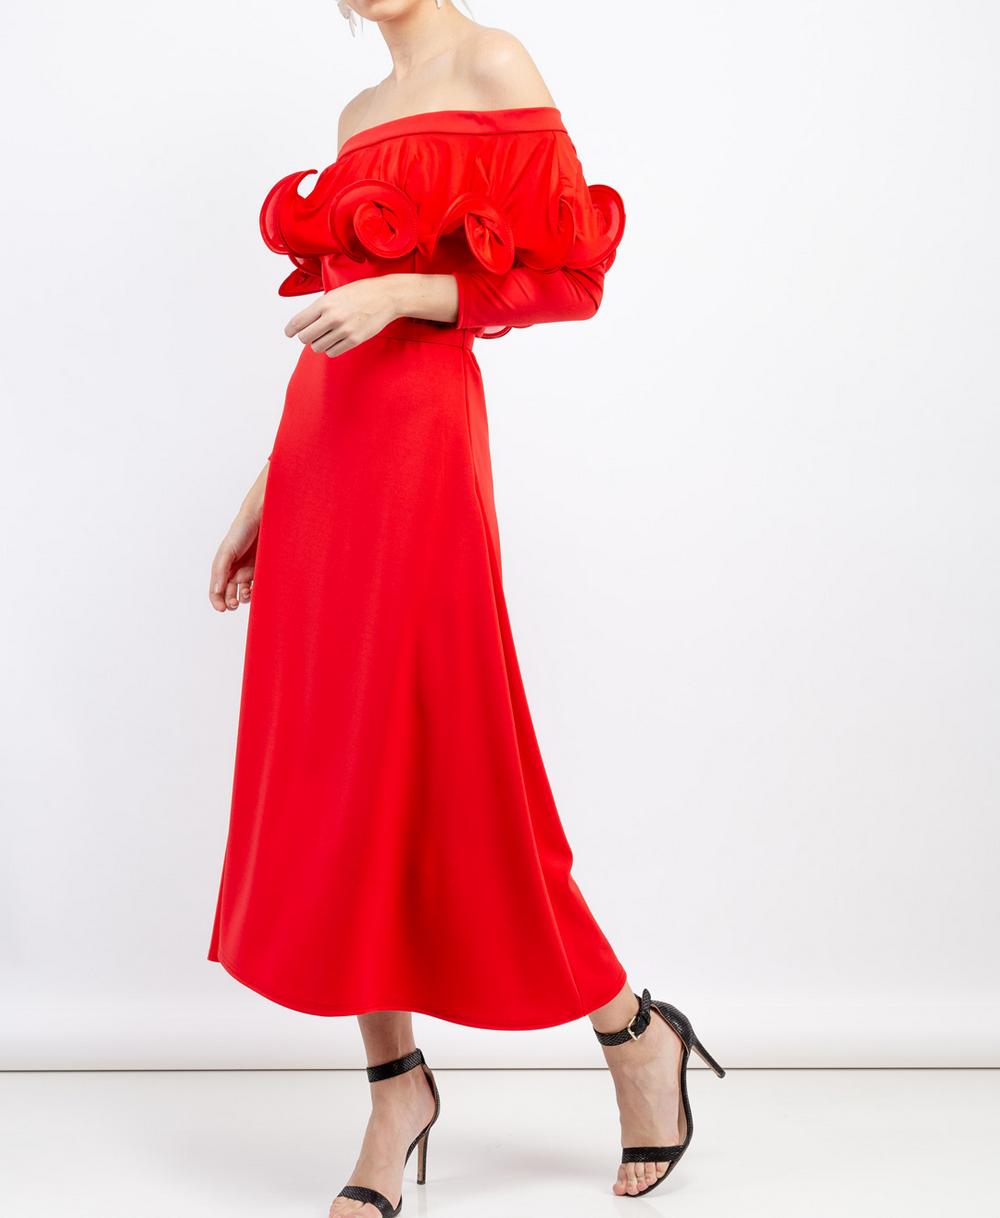 Laura Daili Wavy dress (2)